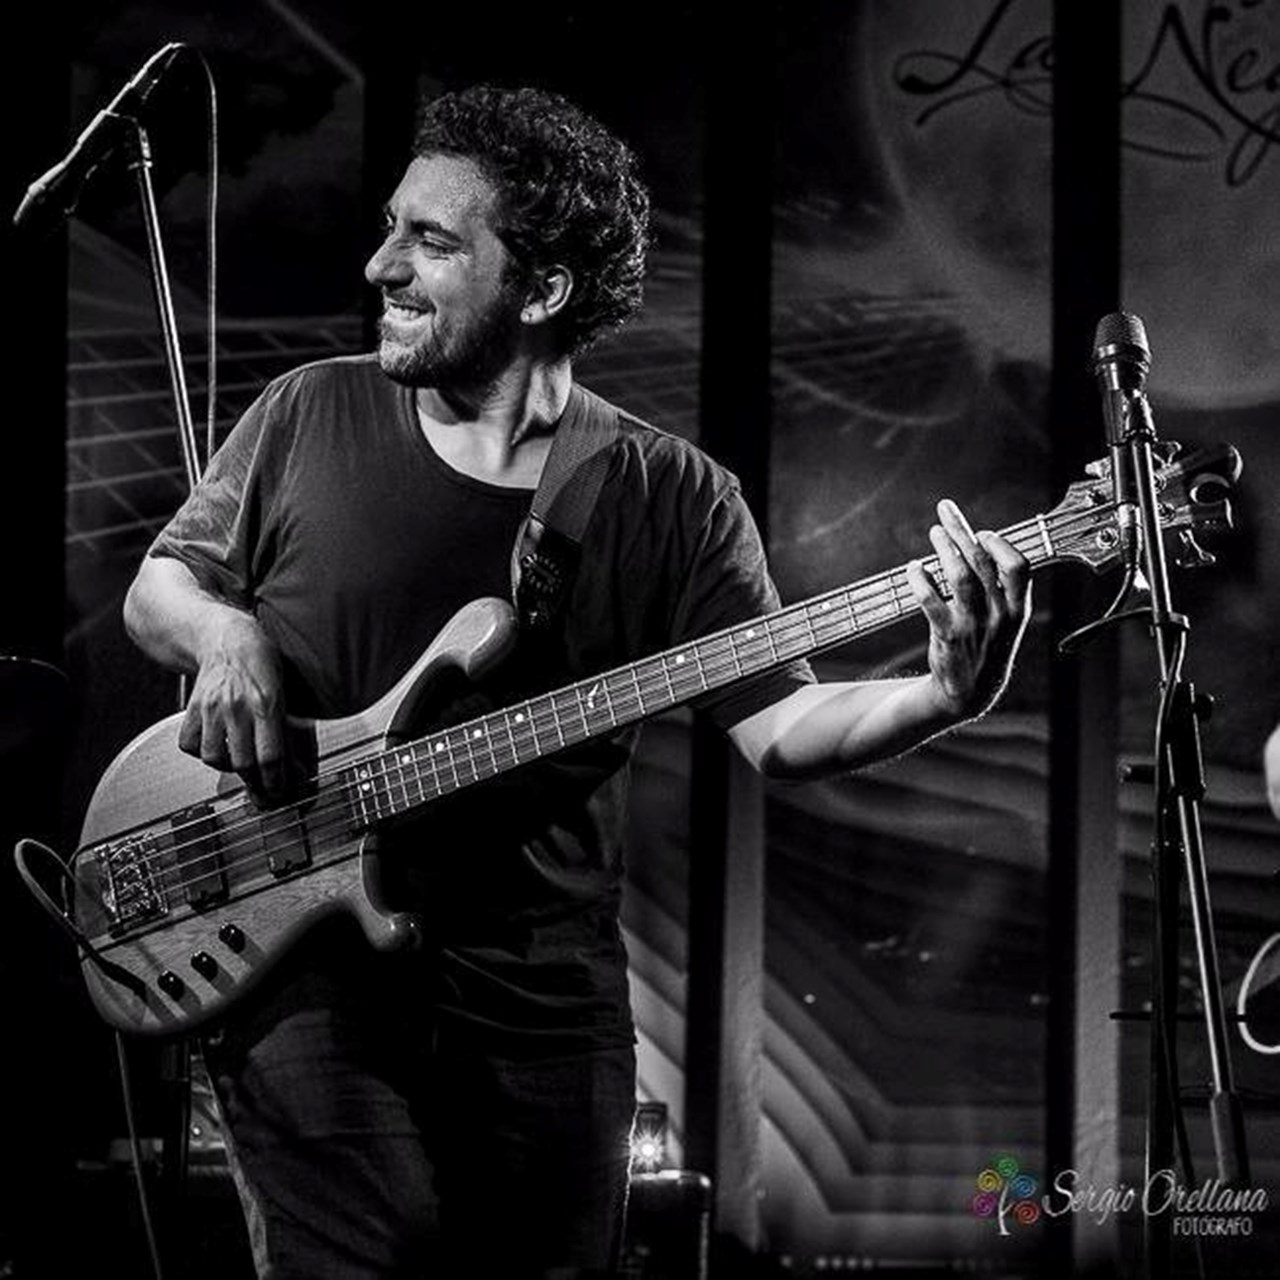 Leo Villagra, Tucuman's musician to present his first jazz CD